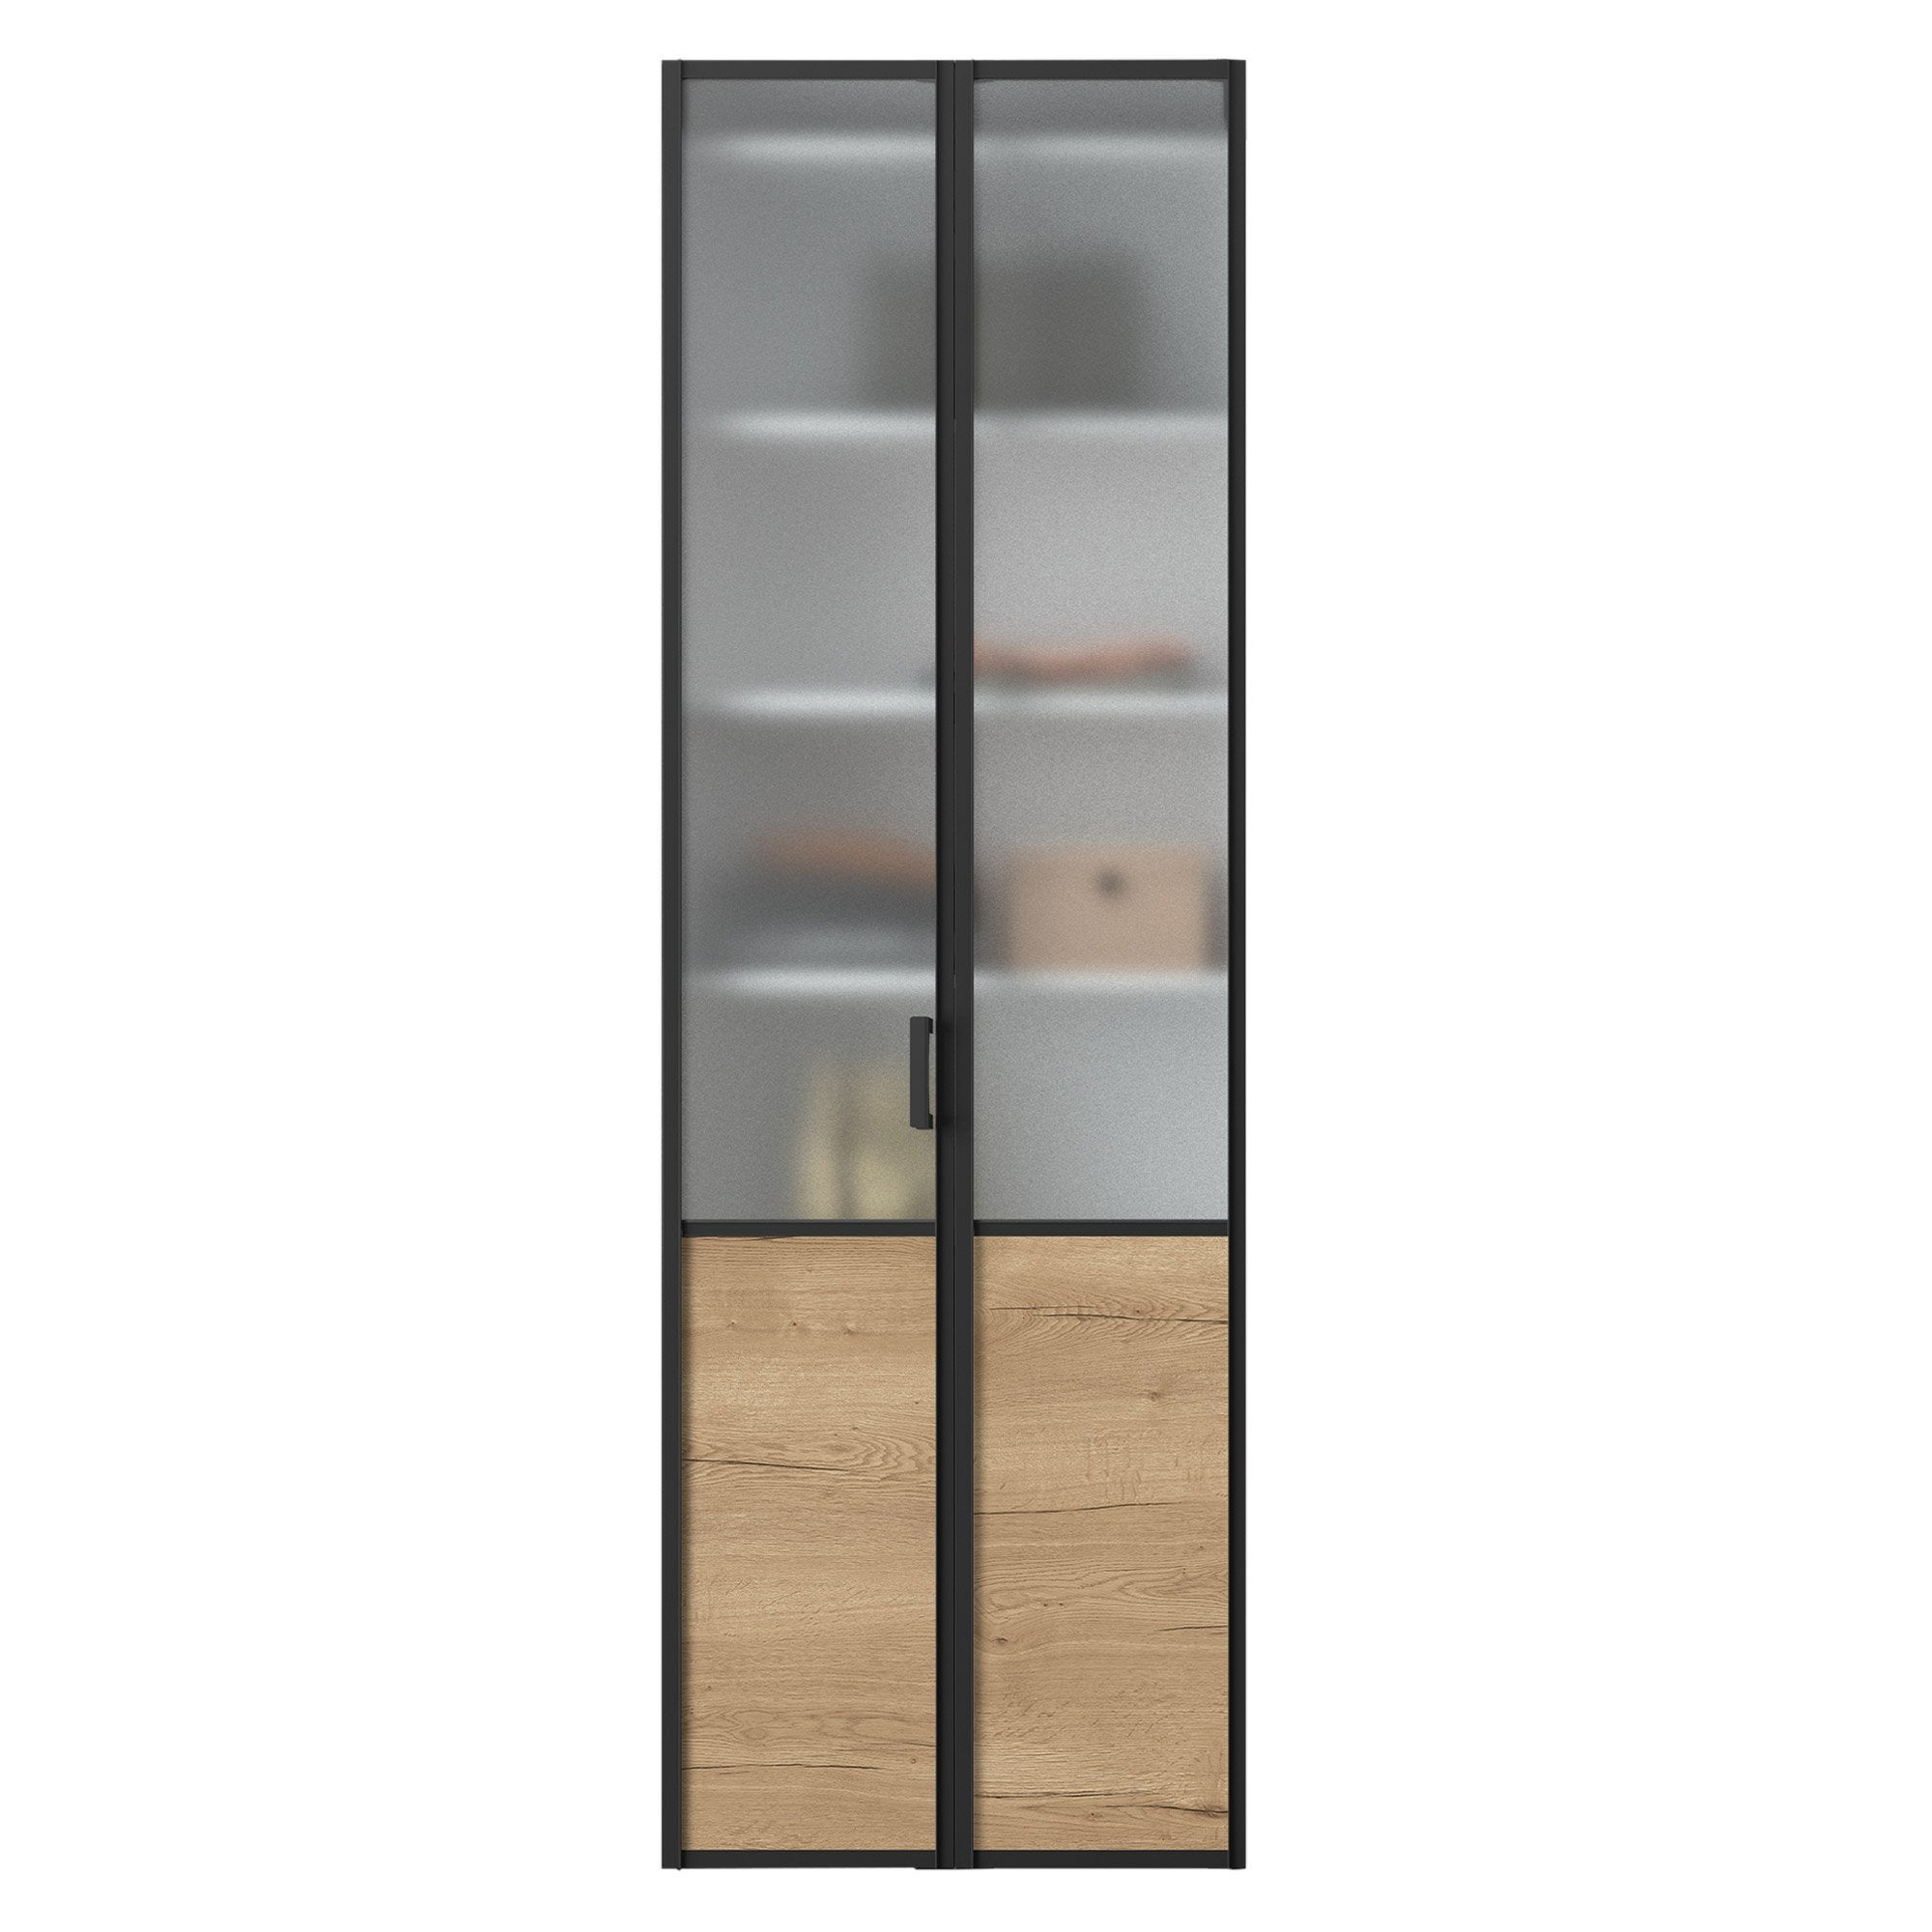 Porte De Séparation Pliante porte de placard pliante sur-mesure iliko loft de 40 à 60 cm